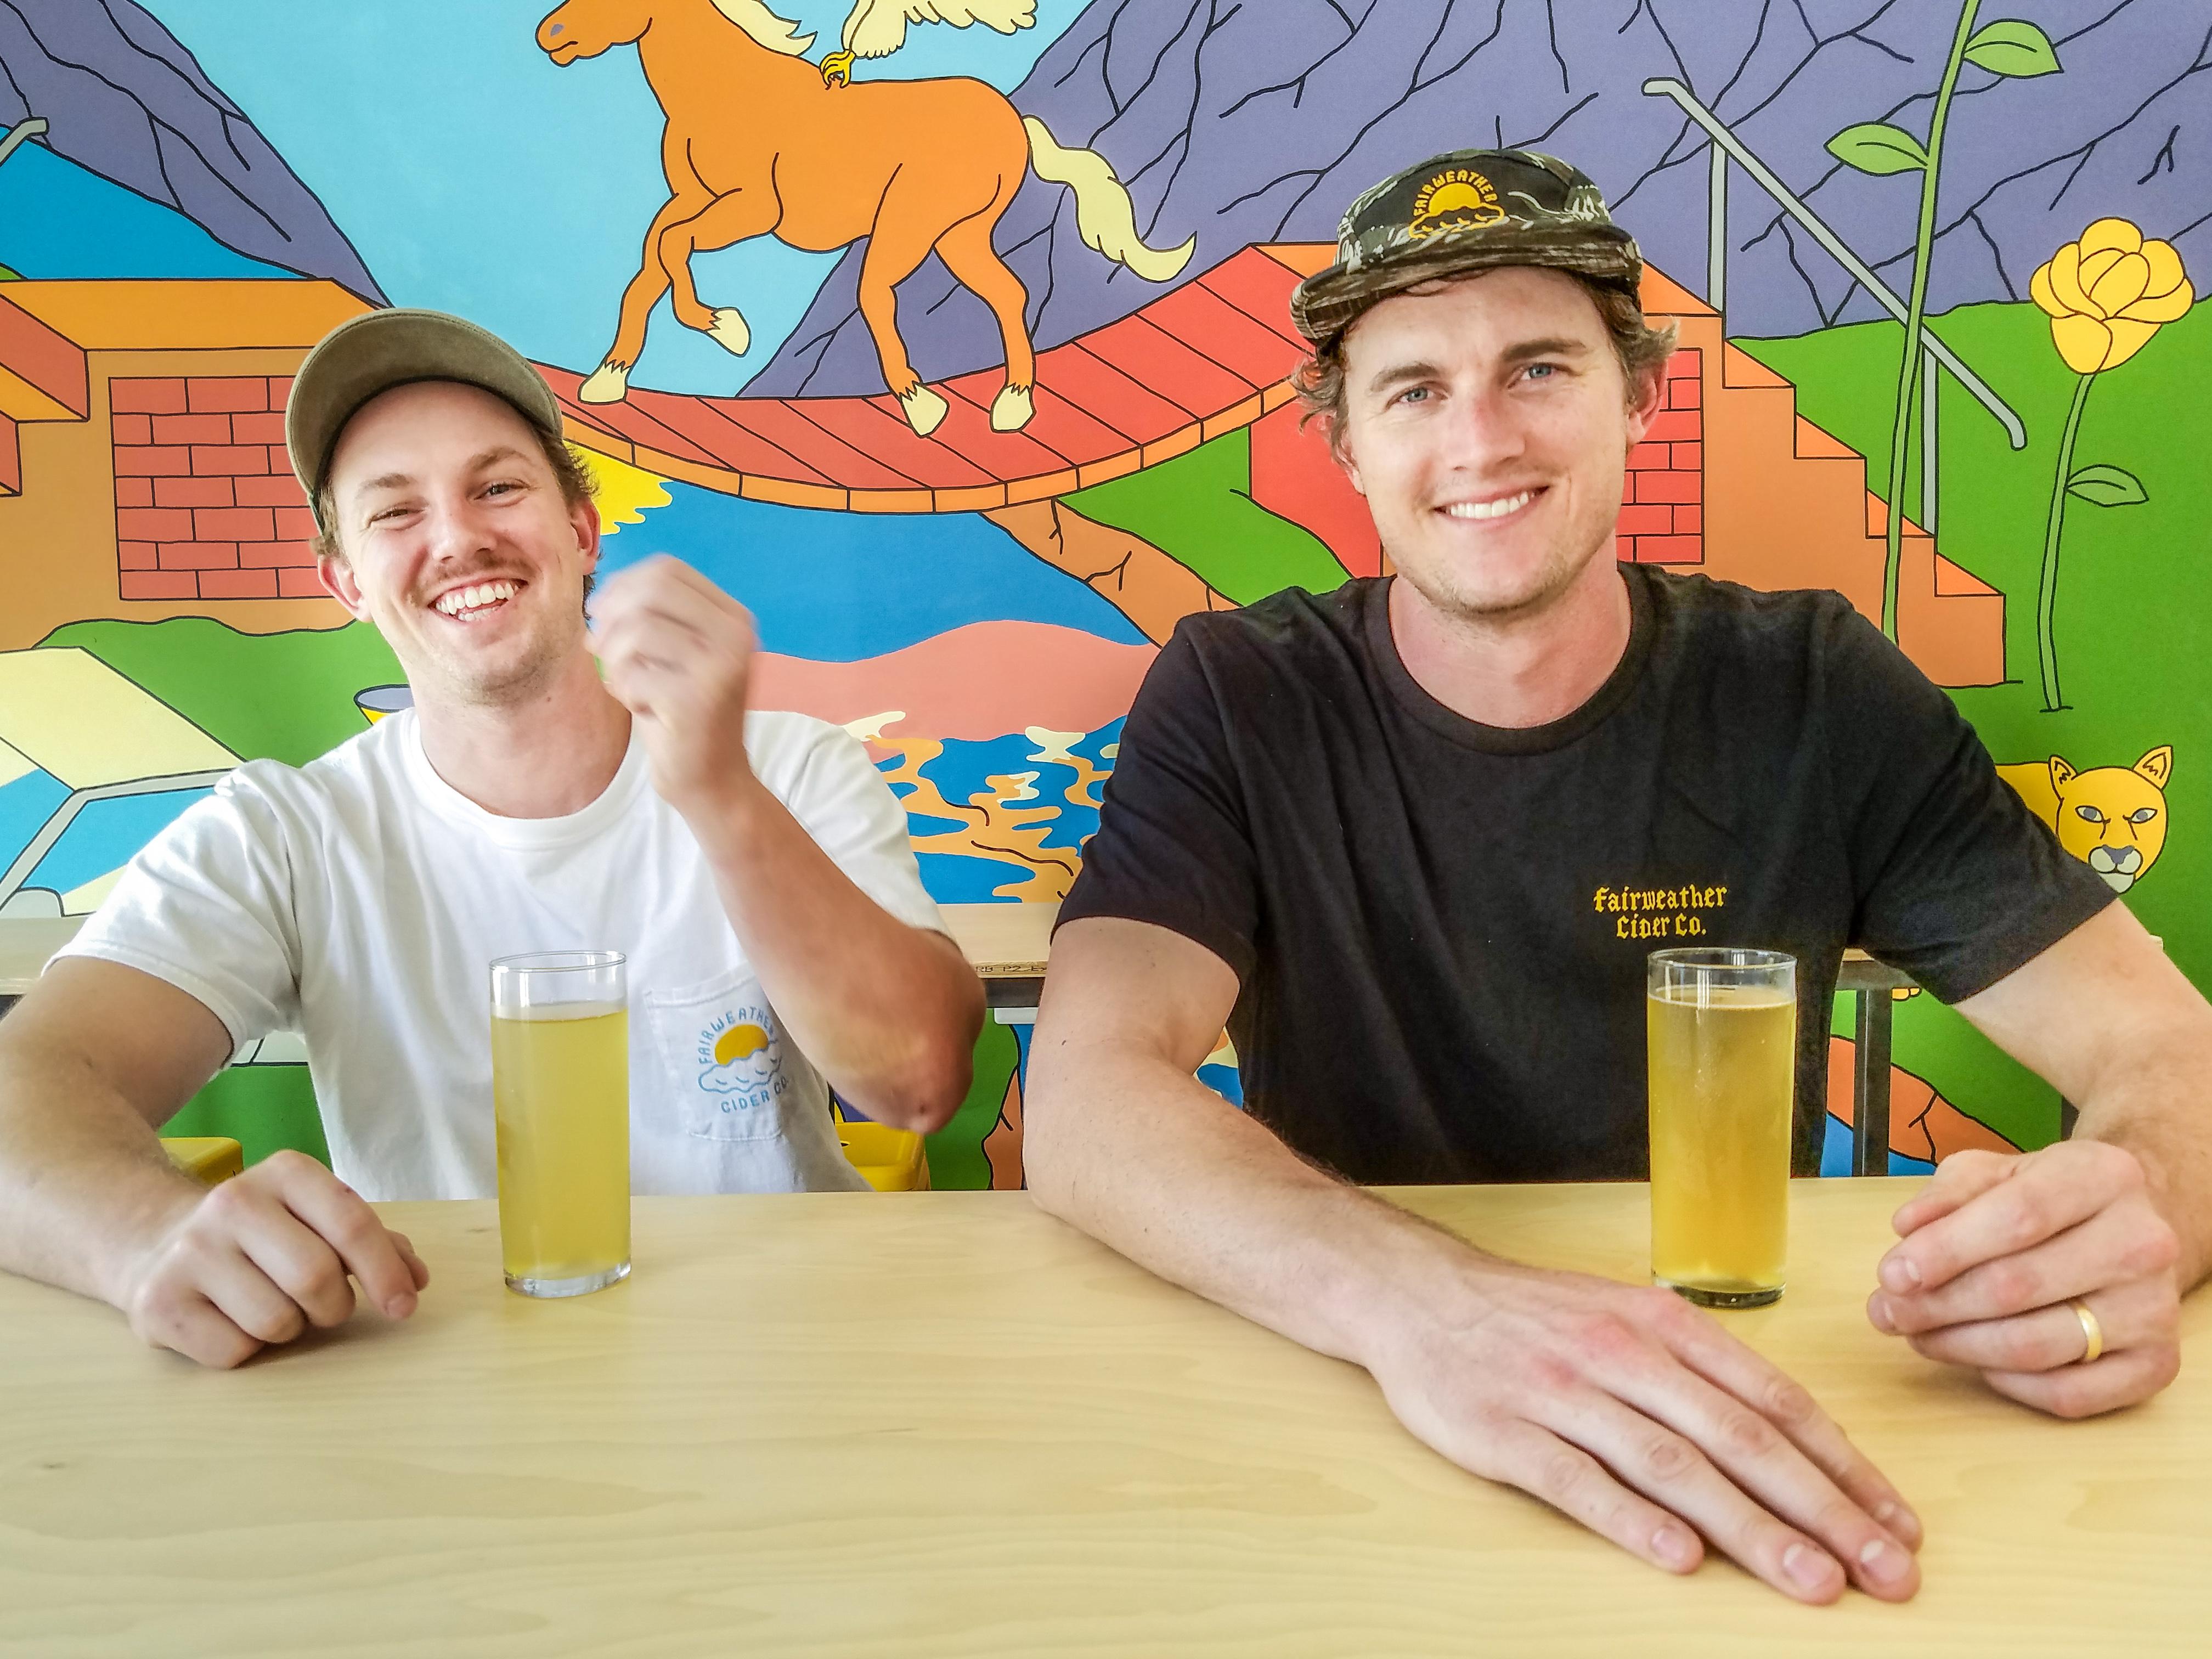 Michael Gostomski White and John Staples at Fairweather Cider Co.